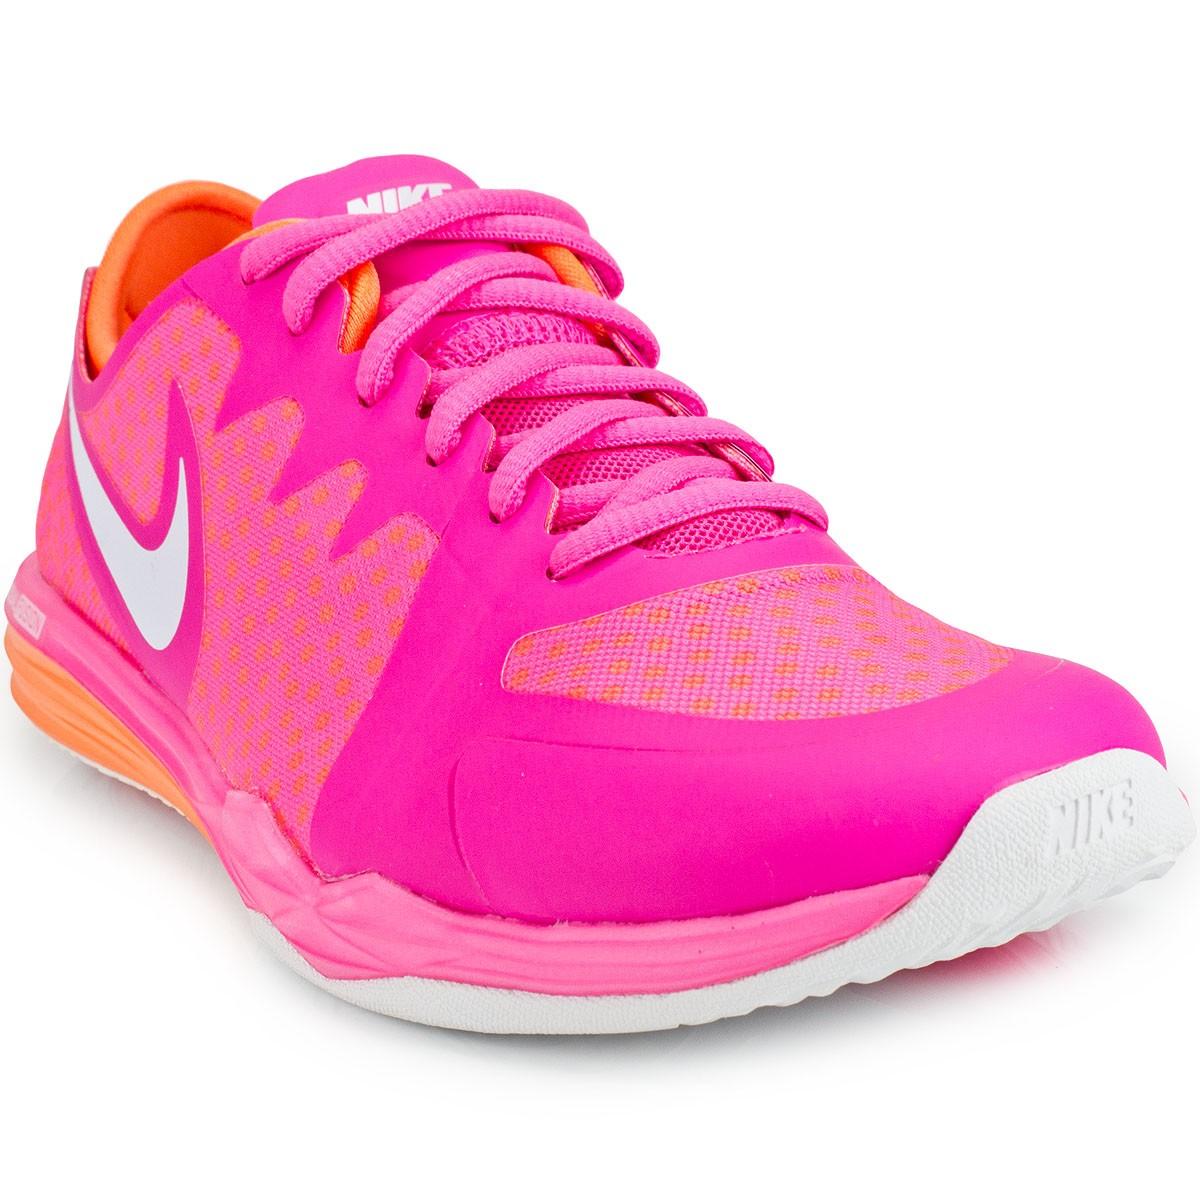 e95344d4267 Tênis Nike Dual Fusion Tr 3 Print W 704941